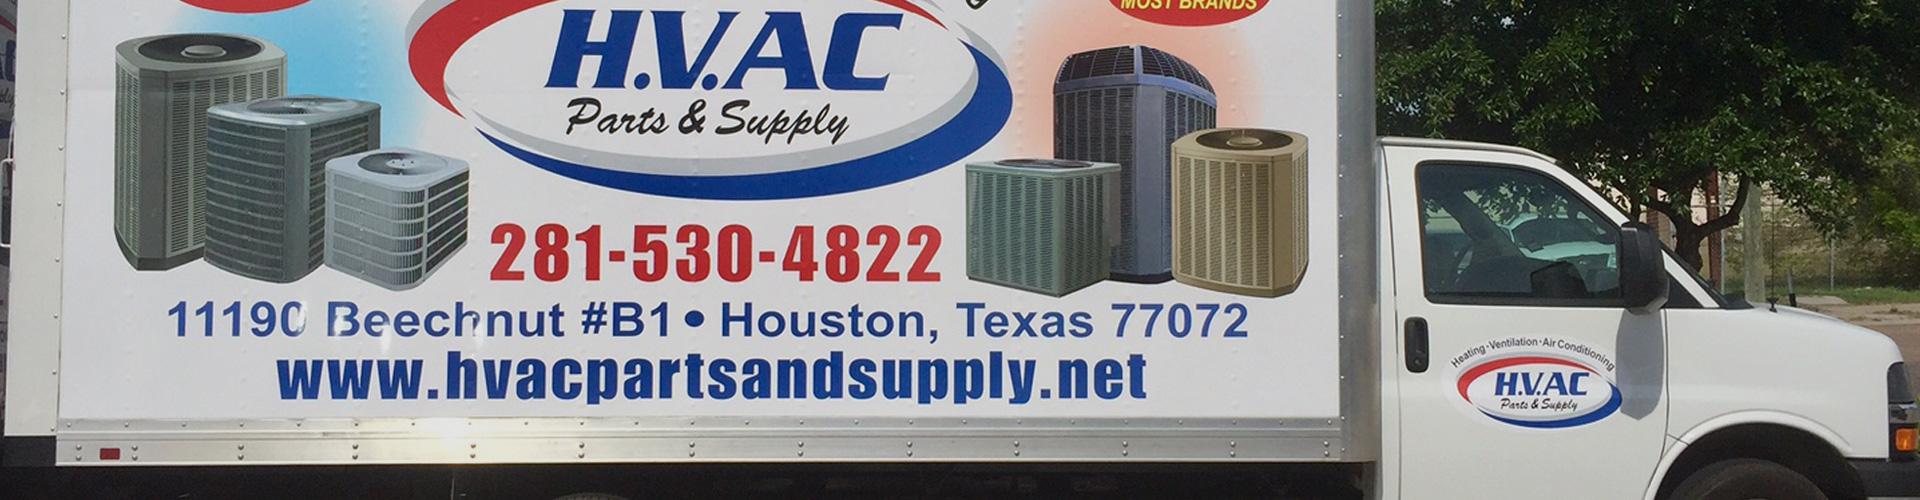 HVAC Parts Store Near Missouri City TX | HVAC Parts & Supply